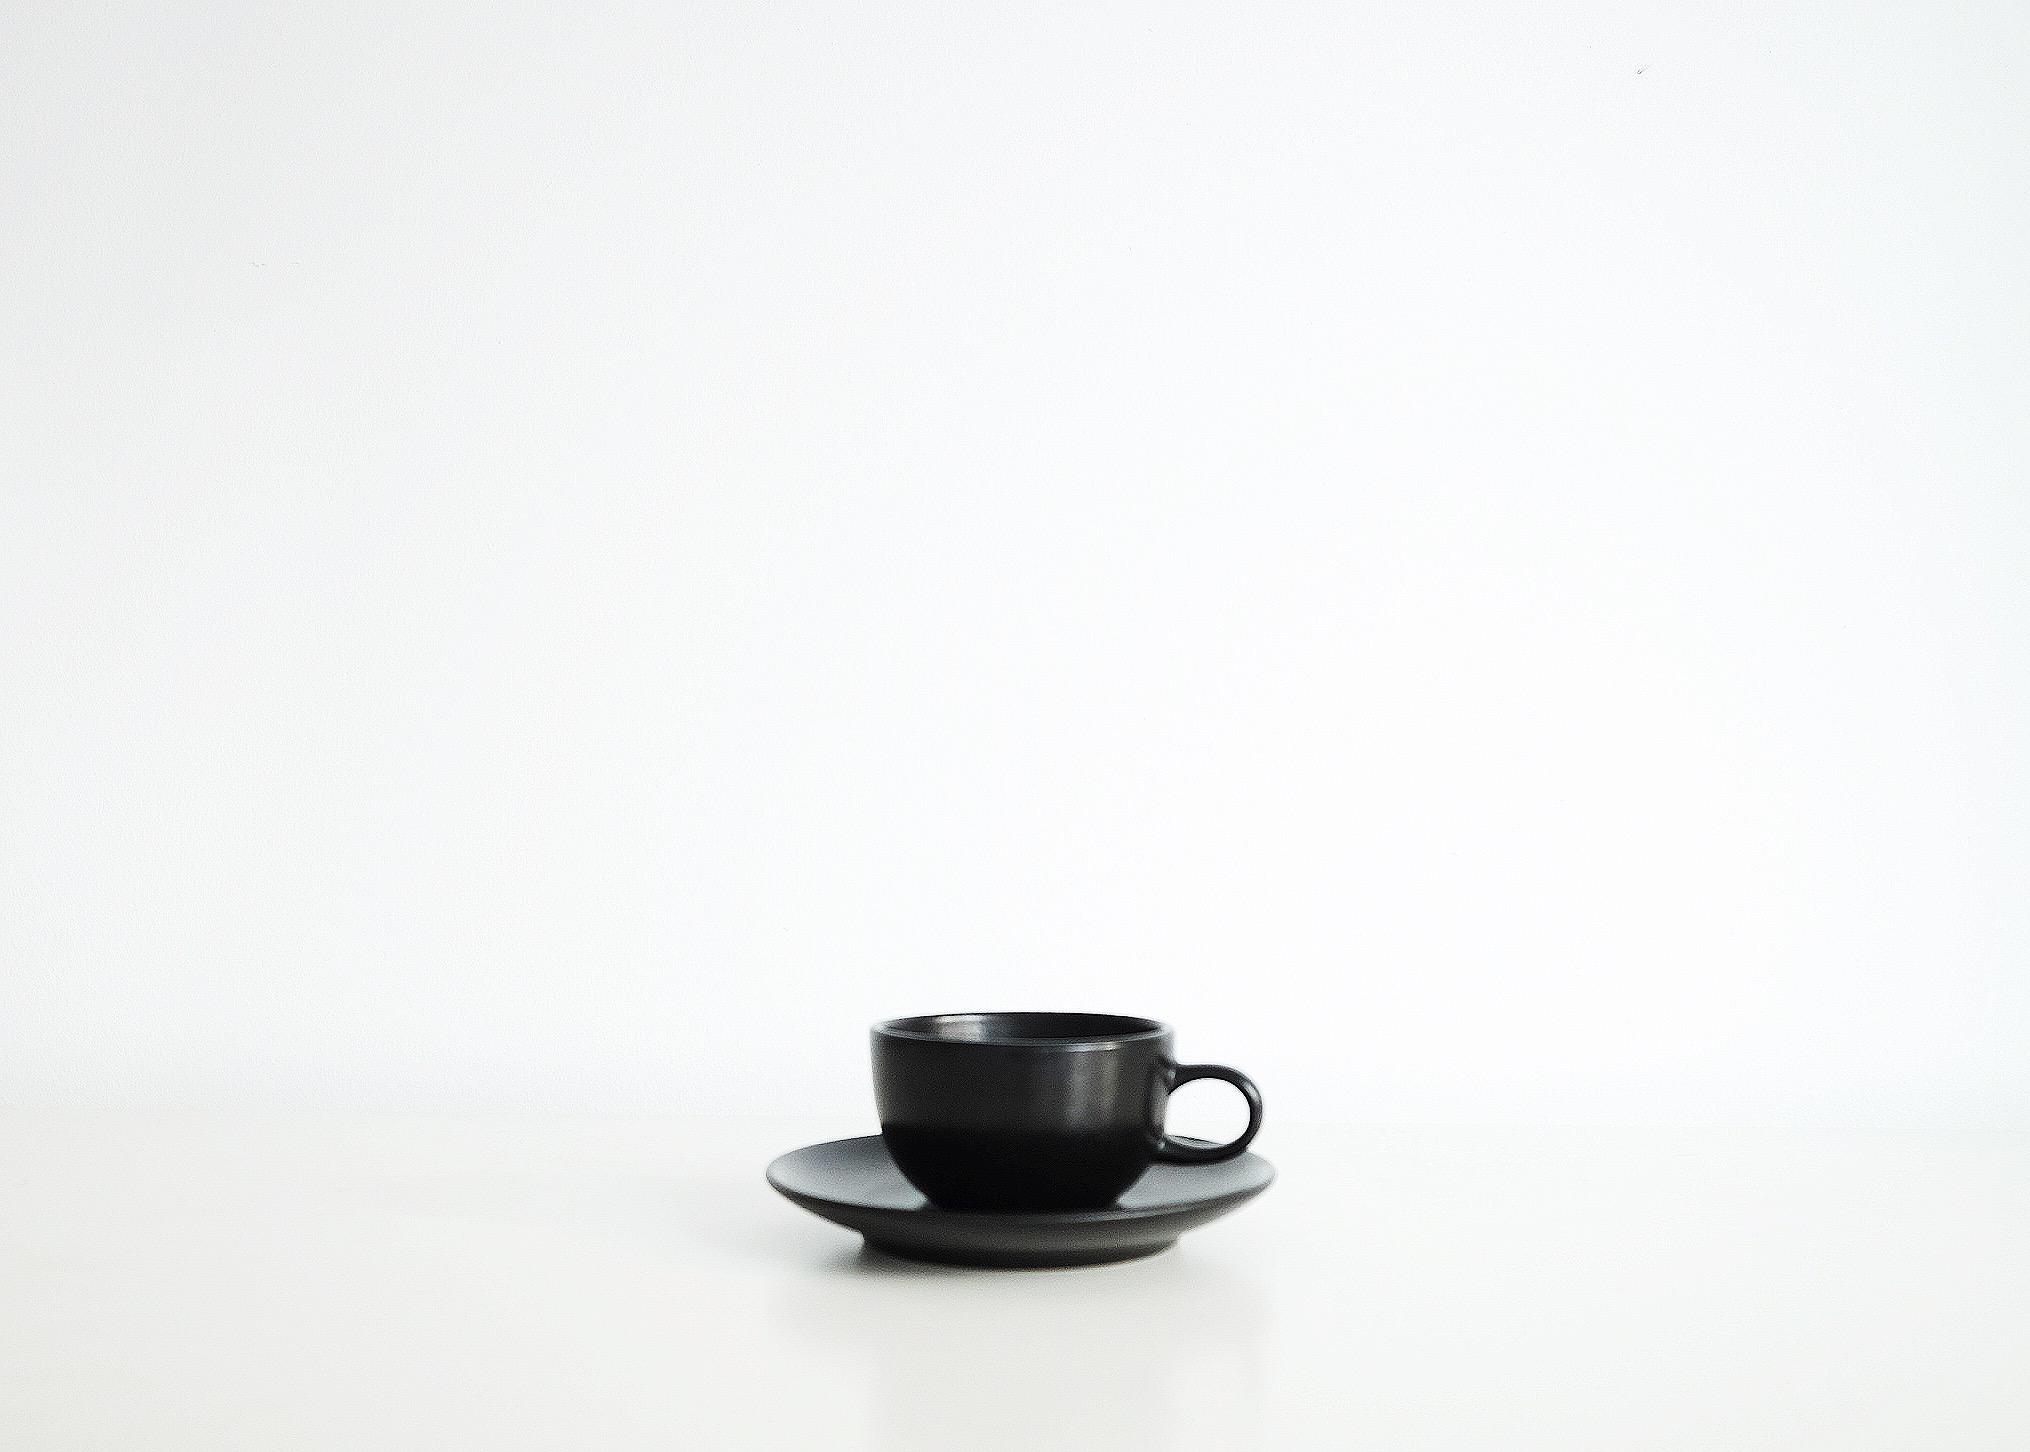 littleblackcoffeecup.jpg